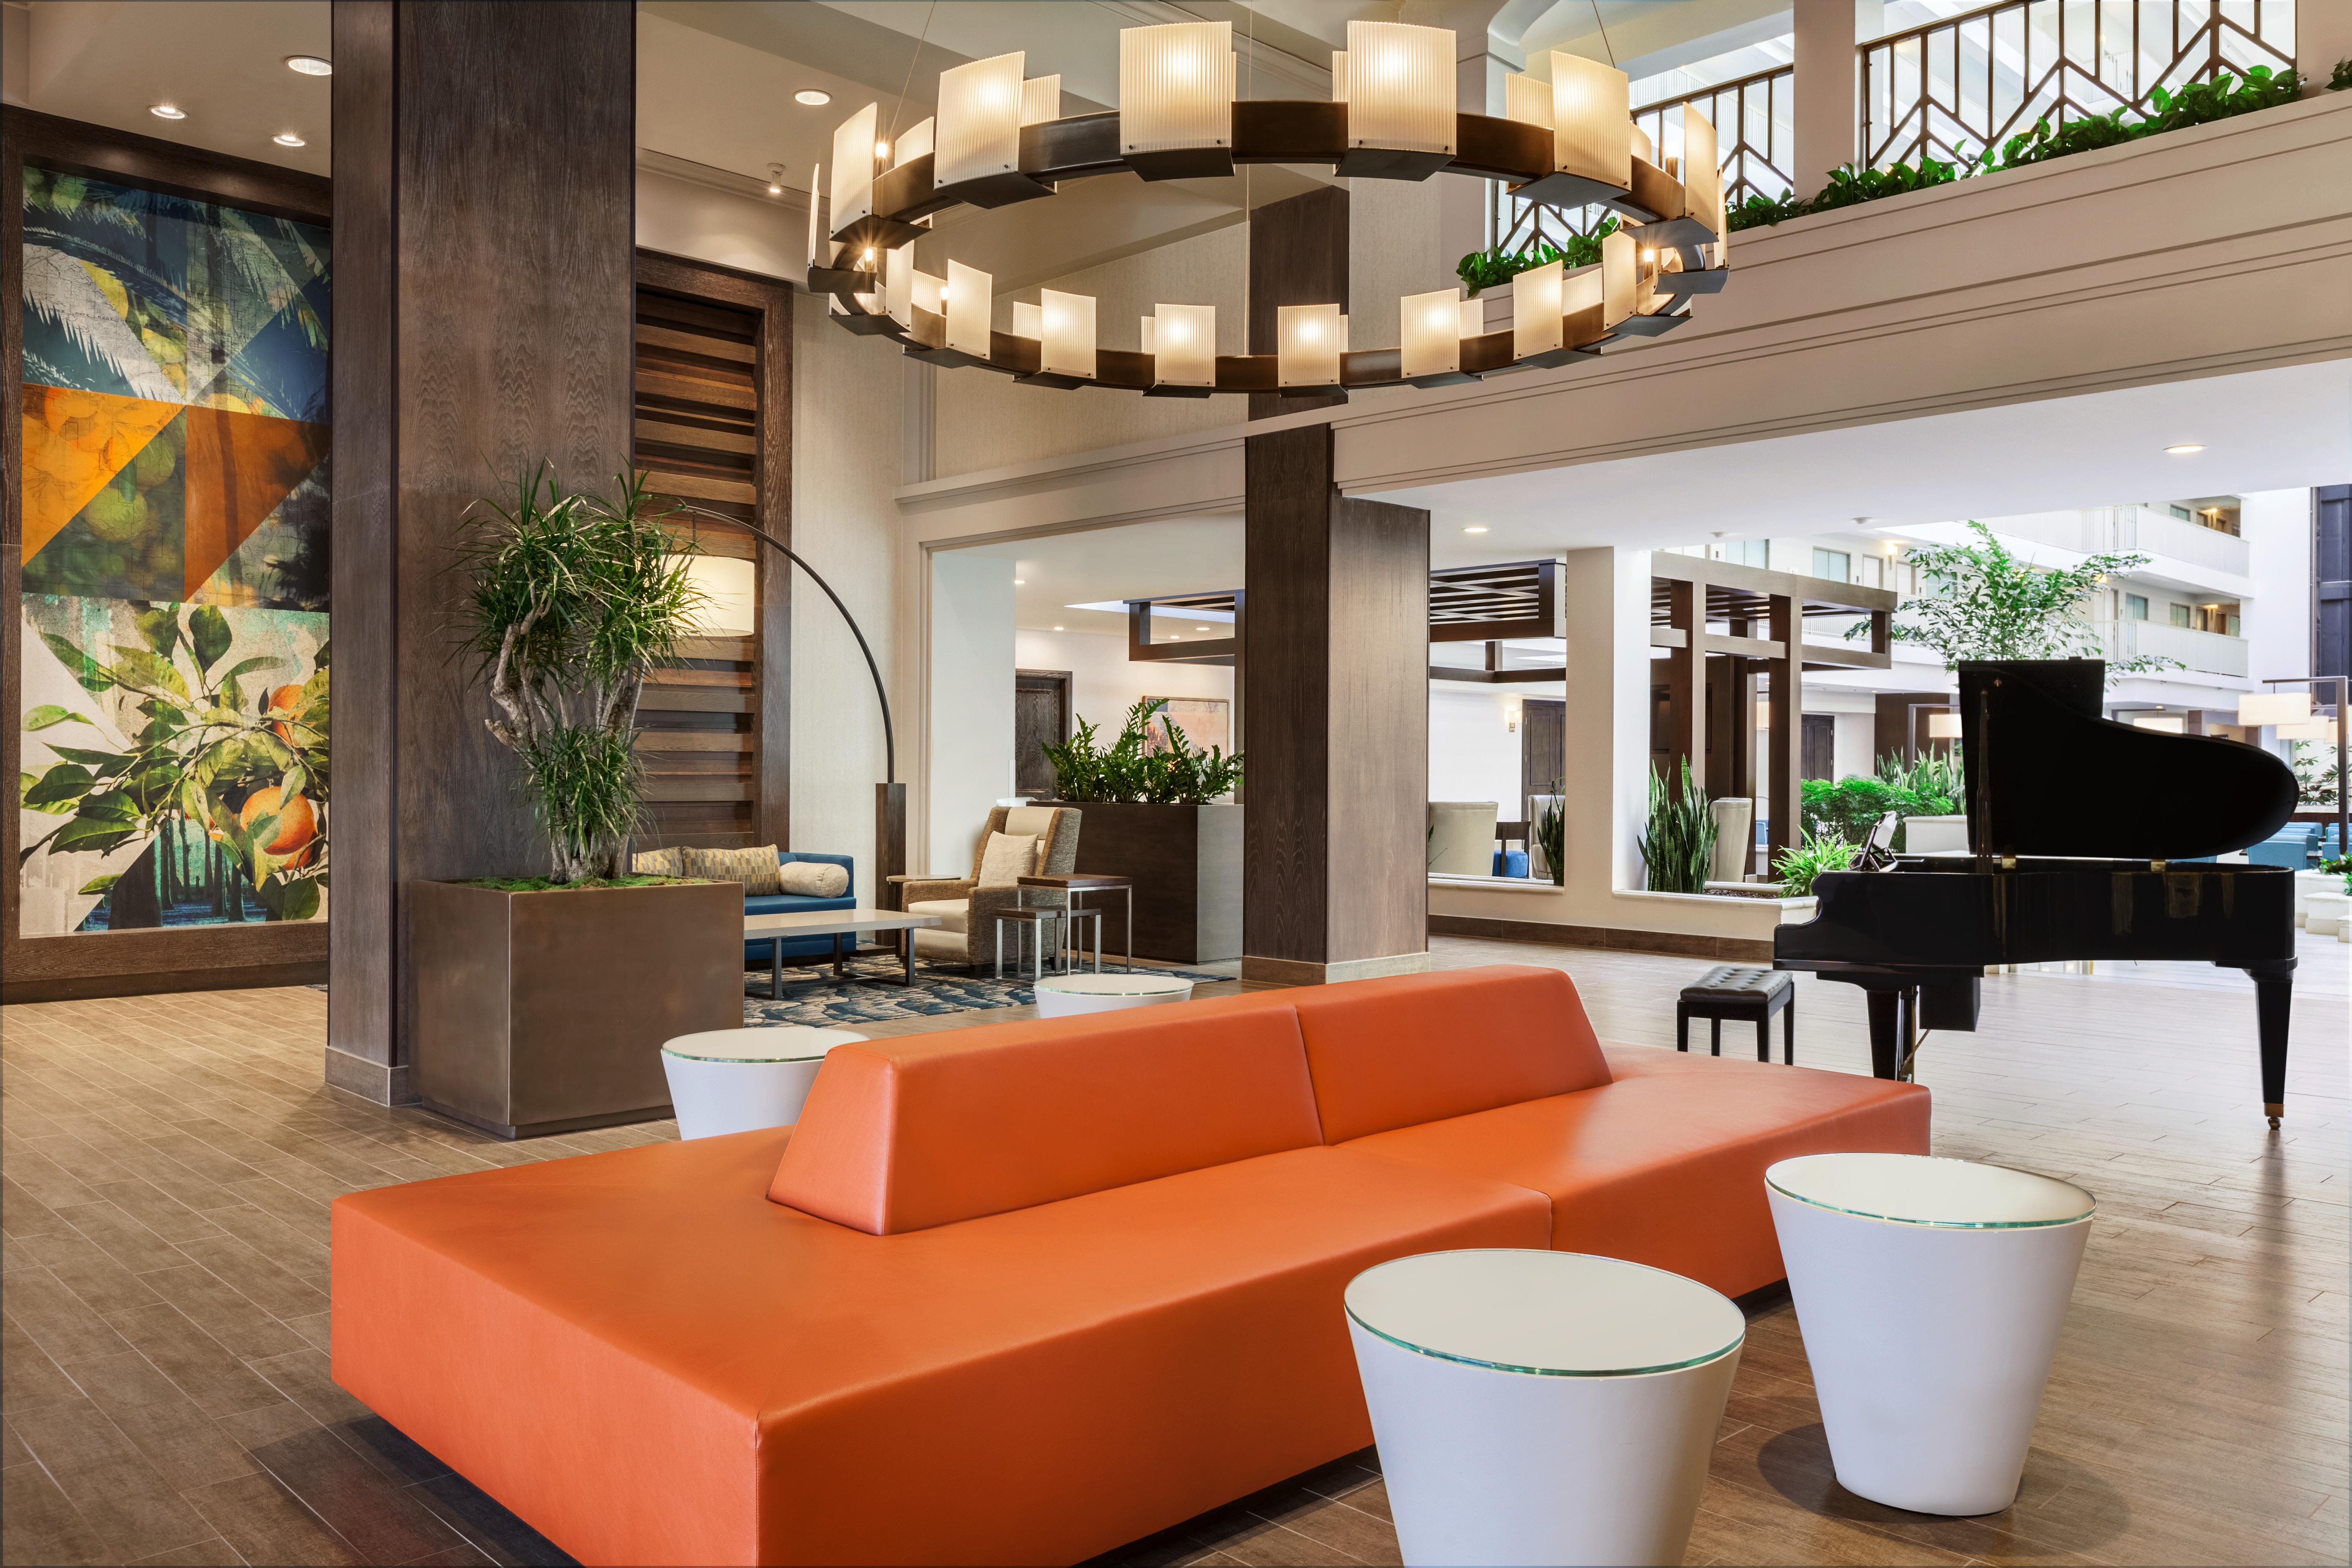 https://www.hotelsbyday.com/_data/default-hotel_image/2/10346/embassy-suites-by-hilton-brea-north-orange-county-lobby-front-desk-1242466.jpg